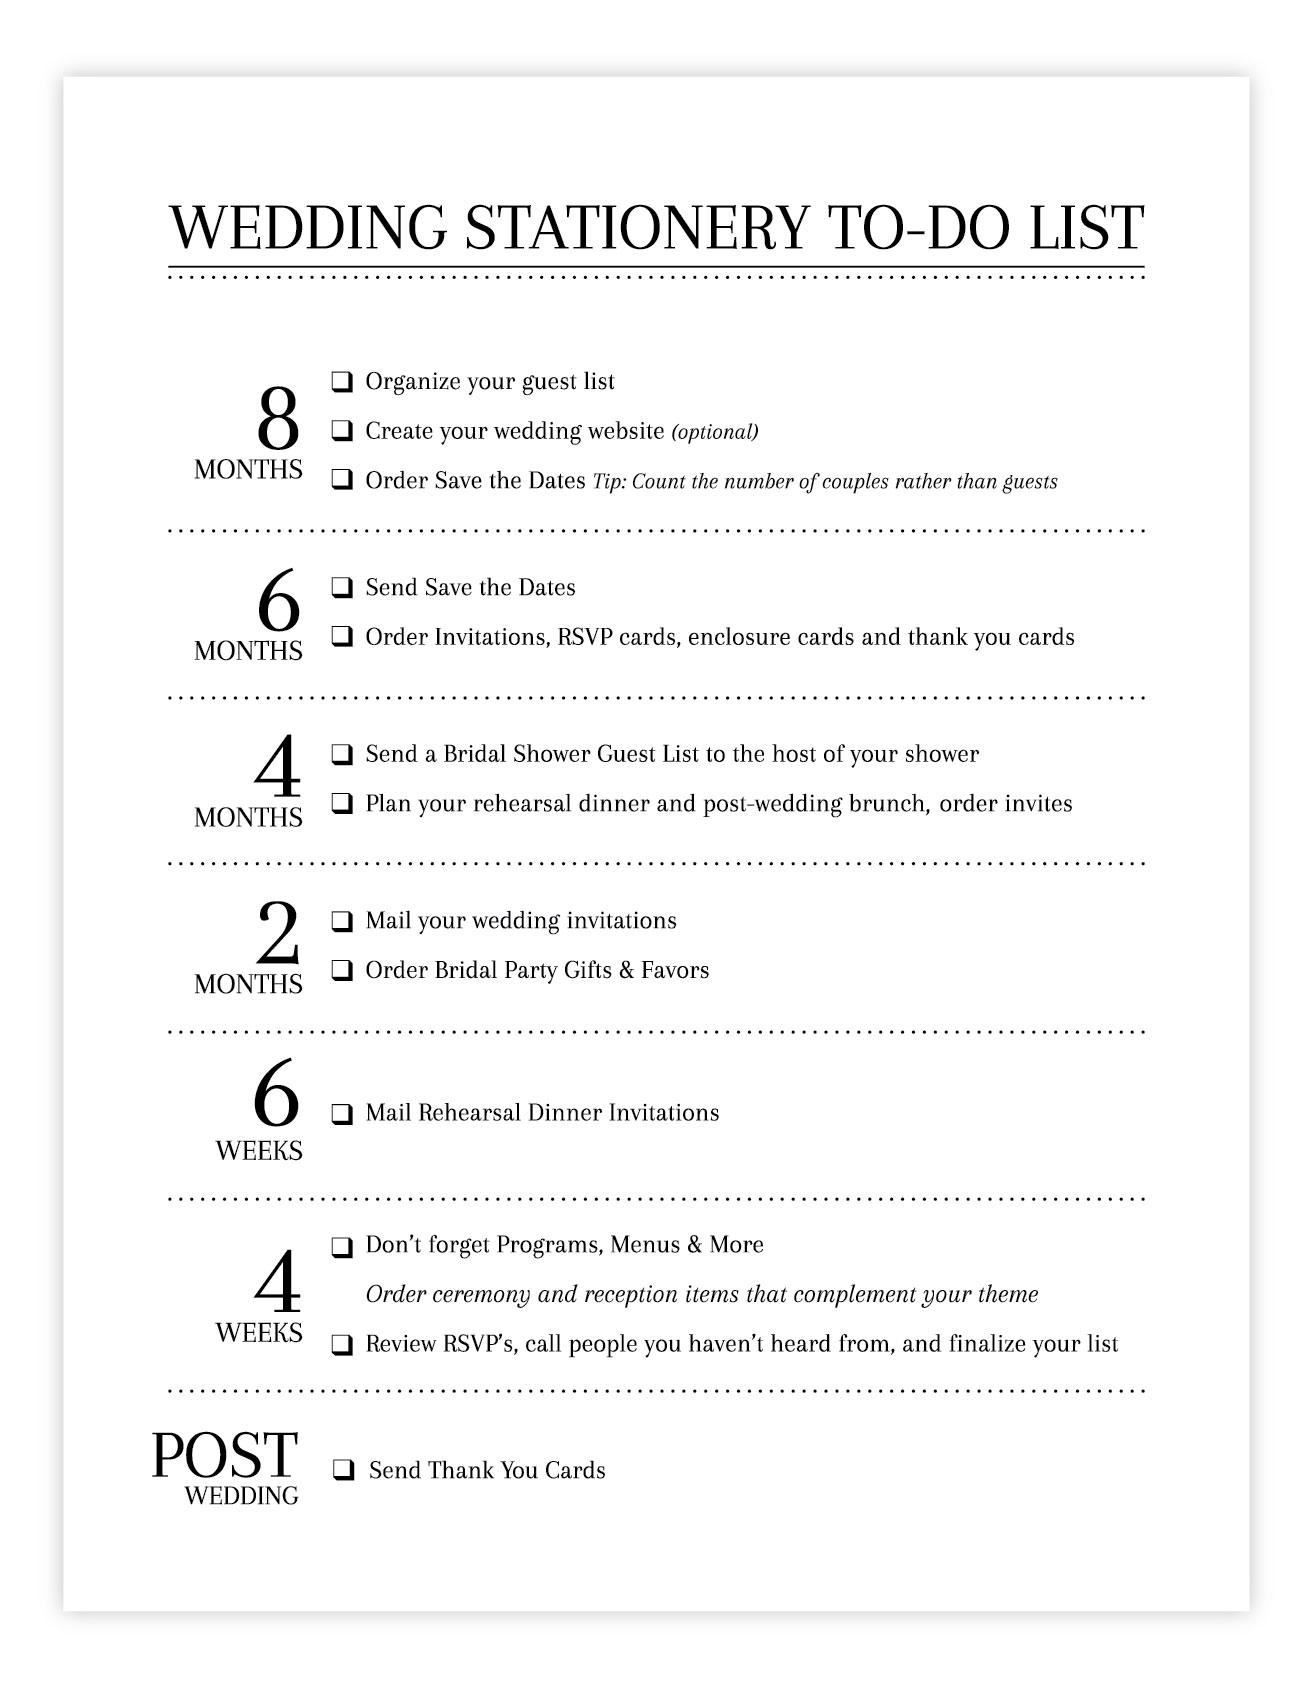 Wedding Stationary To-Do List-01.jpg